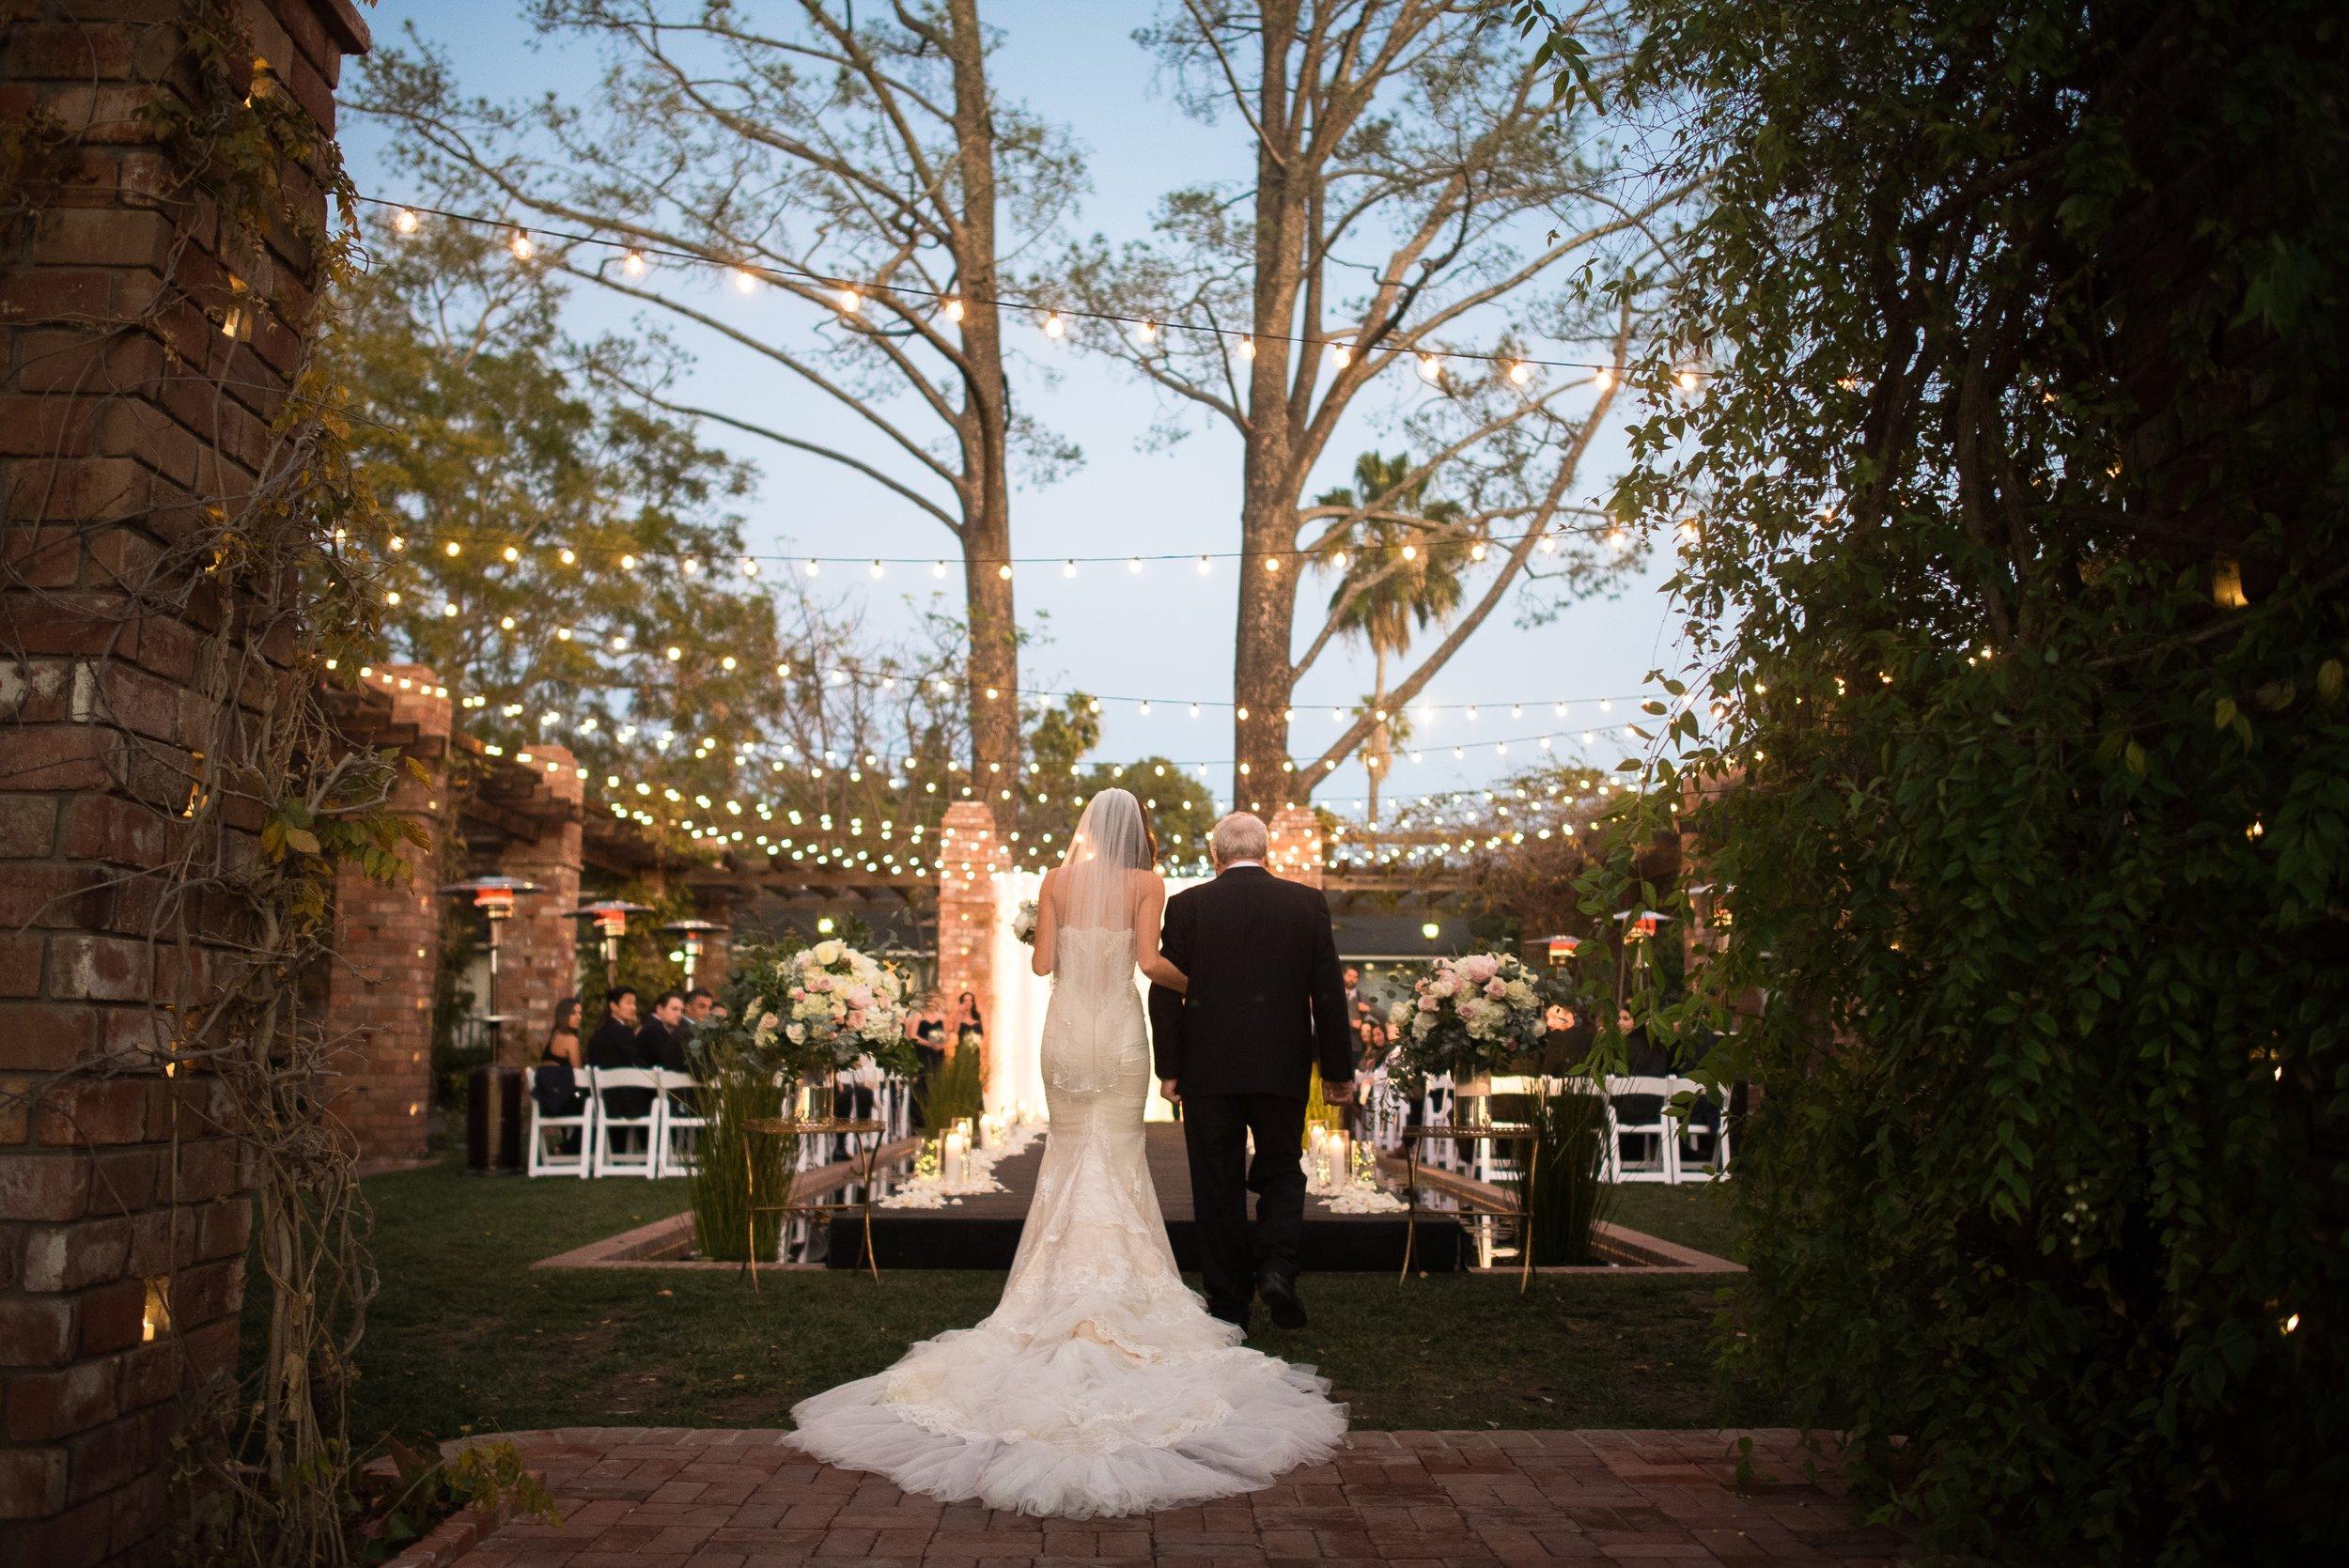 www.santabarbaraweddingstyle.com | Santa Barbara Wedding Style | Felici Events | El Encanto Wedding | Nate and Jenny Weddings | Ceremony Decor | Precious and Blooming